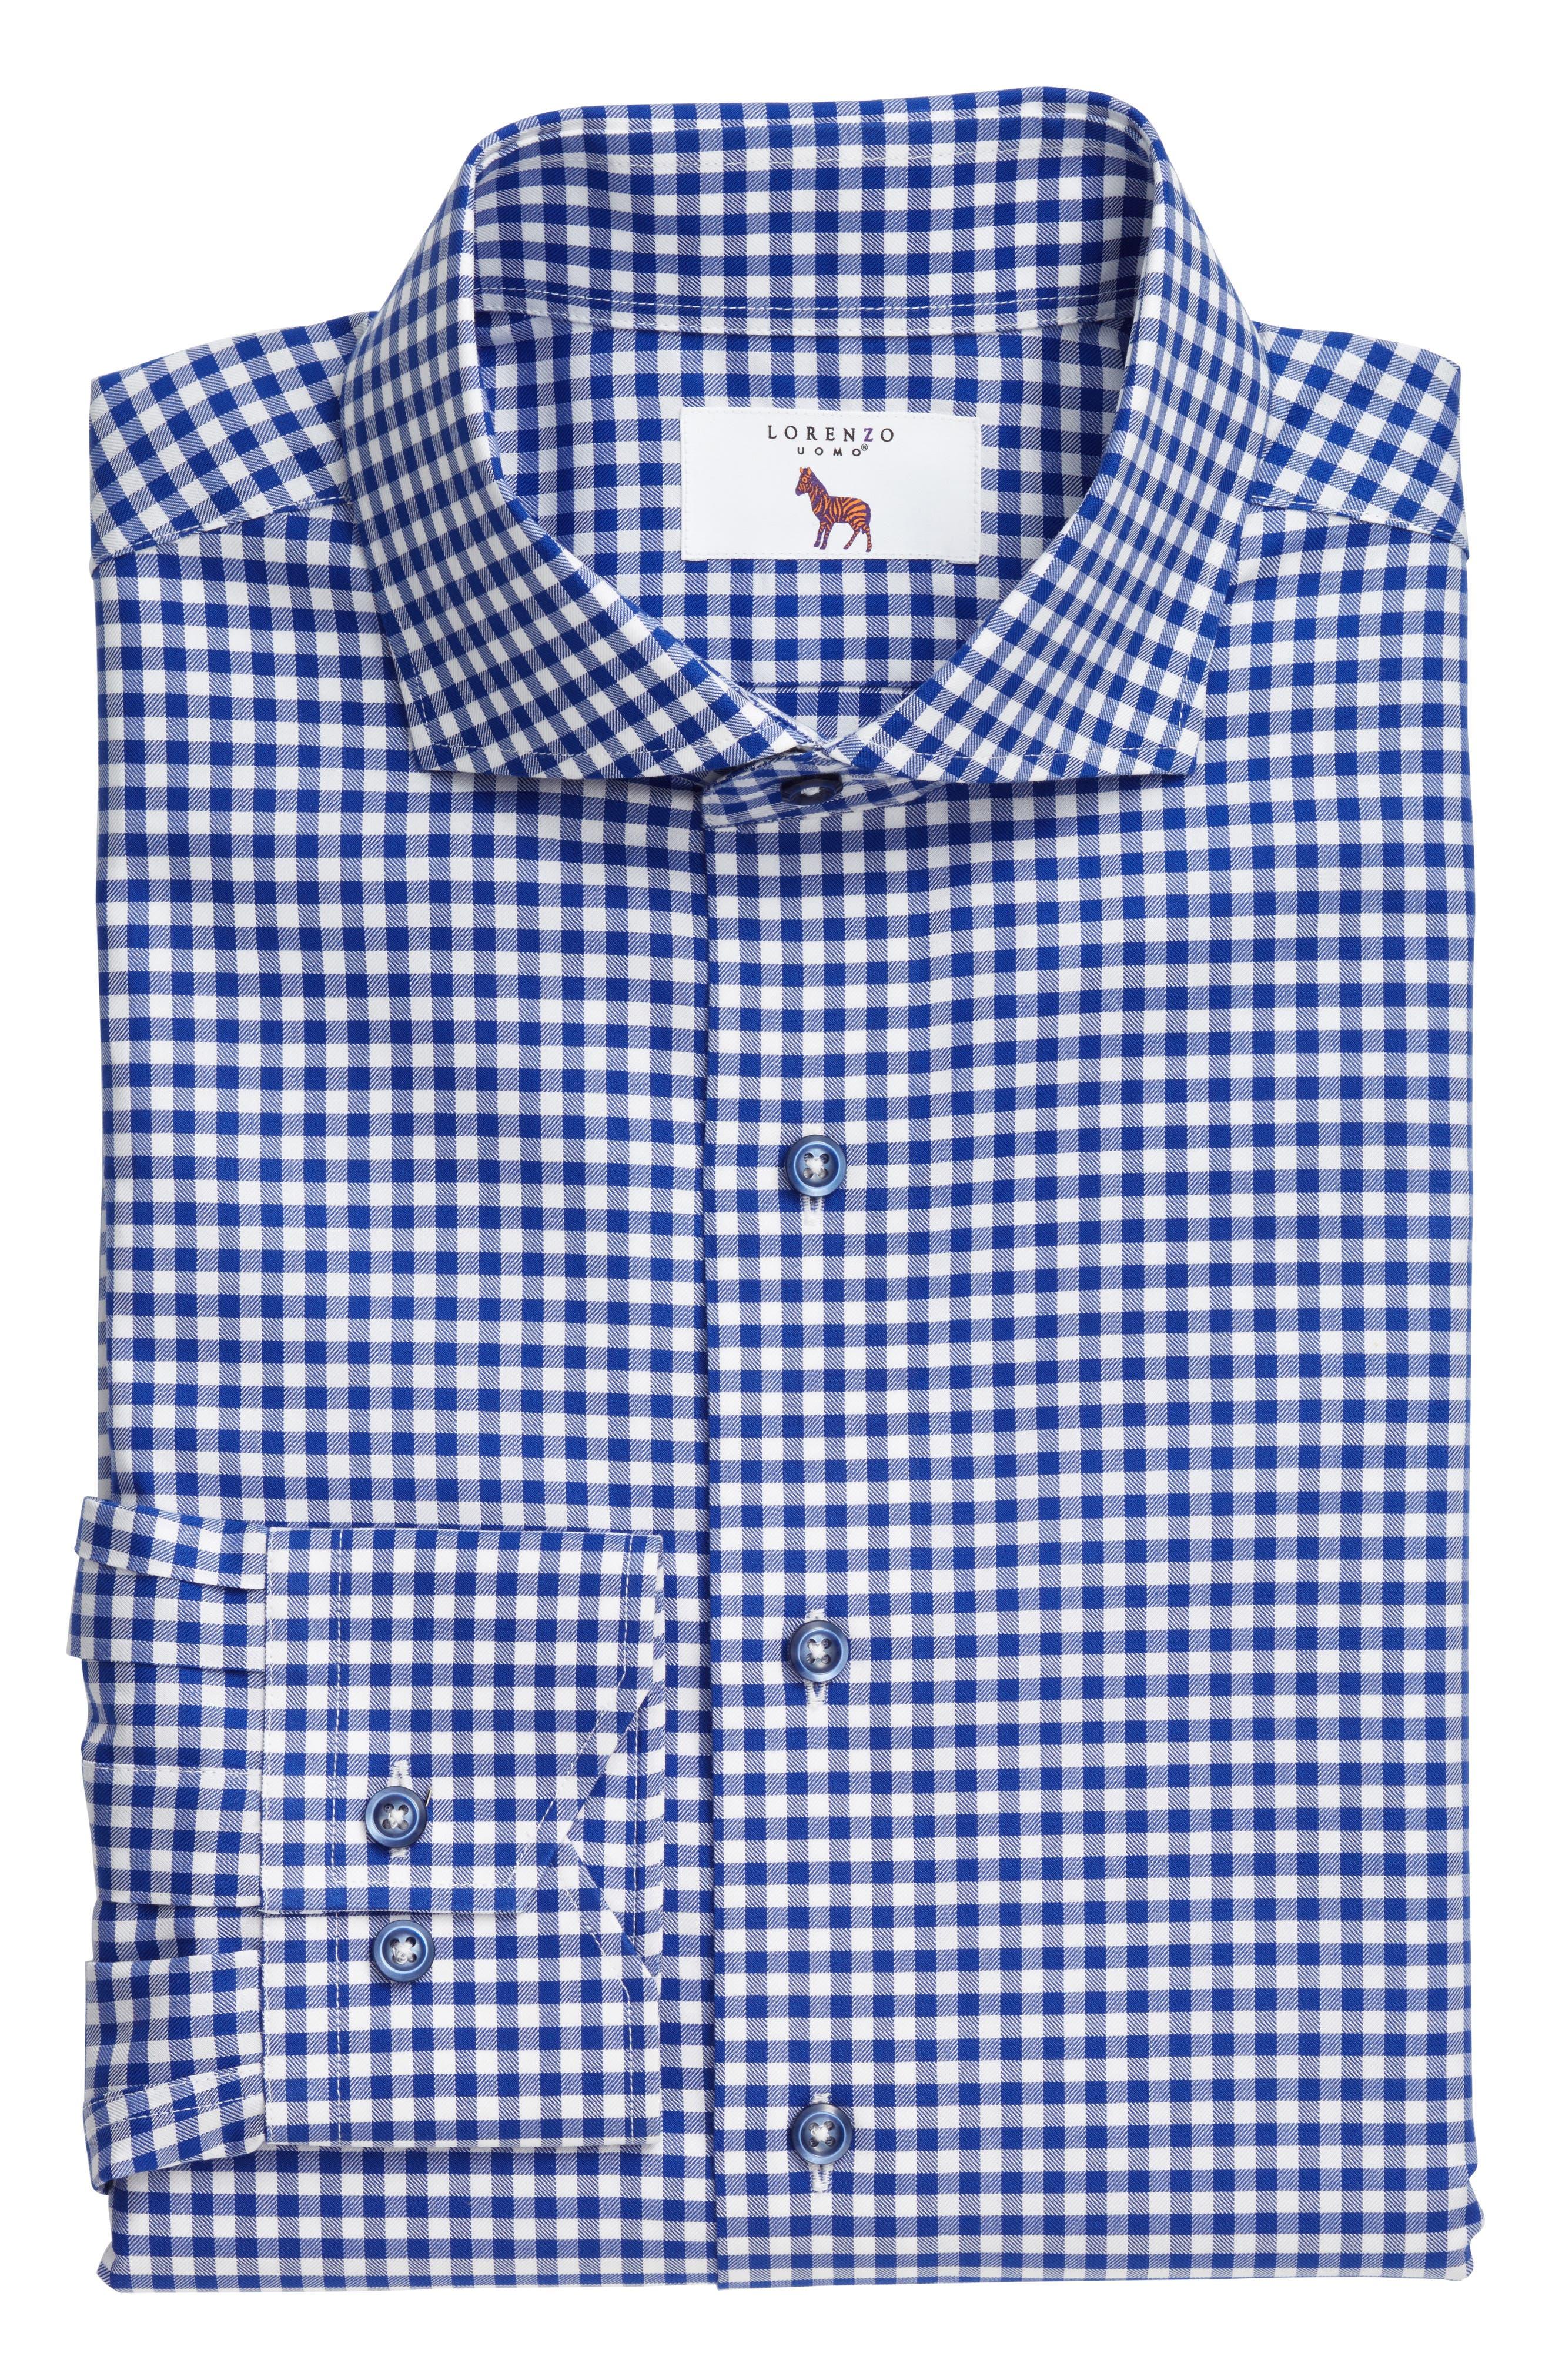 Main Image - Lorenzo Uomo Trim Fit Textured Gingham Dress Shirt